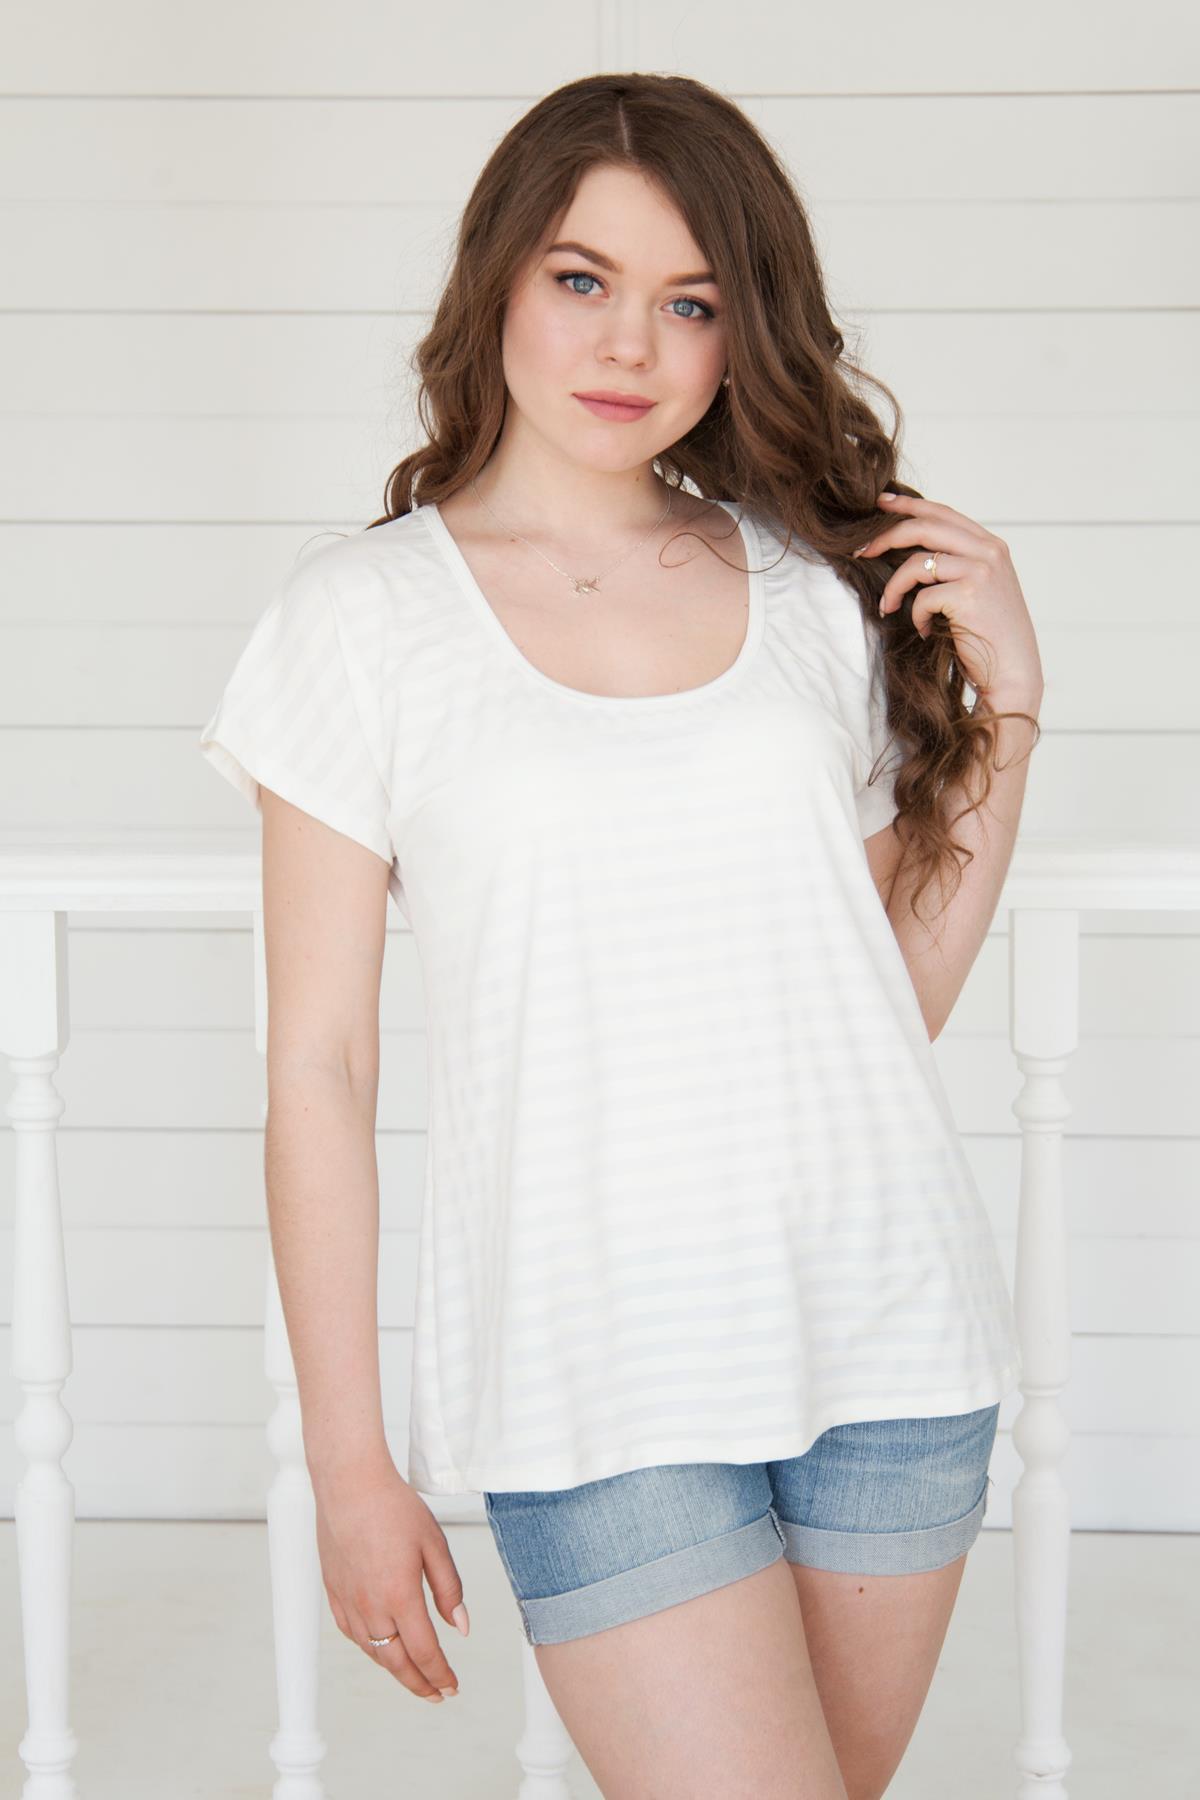 Жен. футболка арт. 19-0161 Молочный р. 52Майки и футболки<br>Факт. ОГ: 112 см <br>Факт. ОТ: 112 см <br>Факт. ОБ: 120 см <br>Длина по спинке: 68 см<br><br>Тип: Жен. футболка<br>Размер: 52<br>Материал: Вискоза